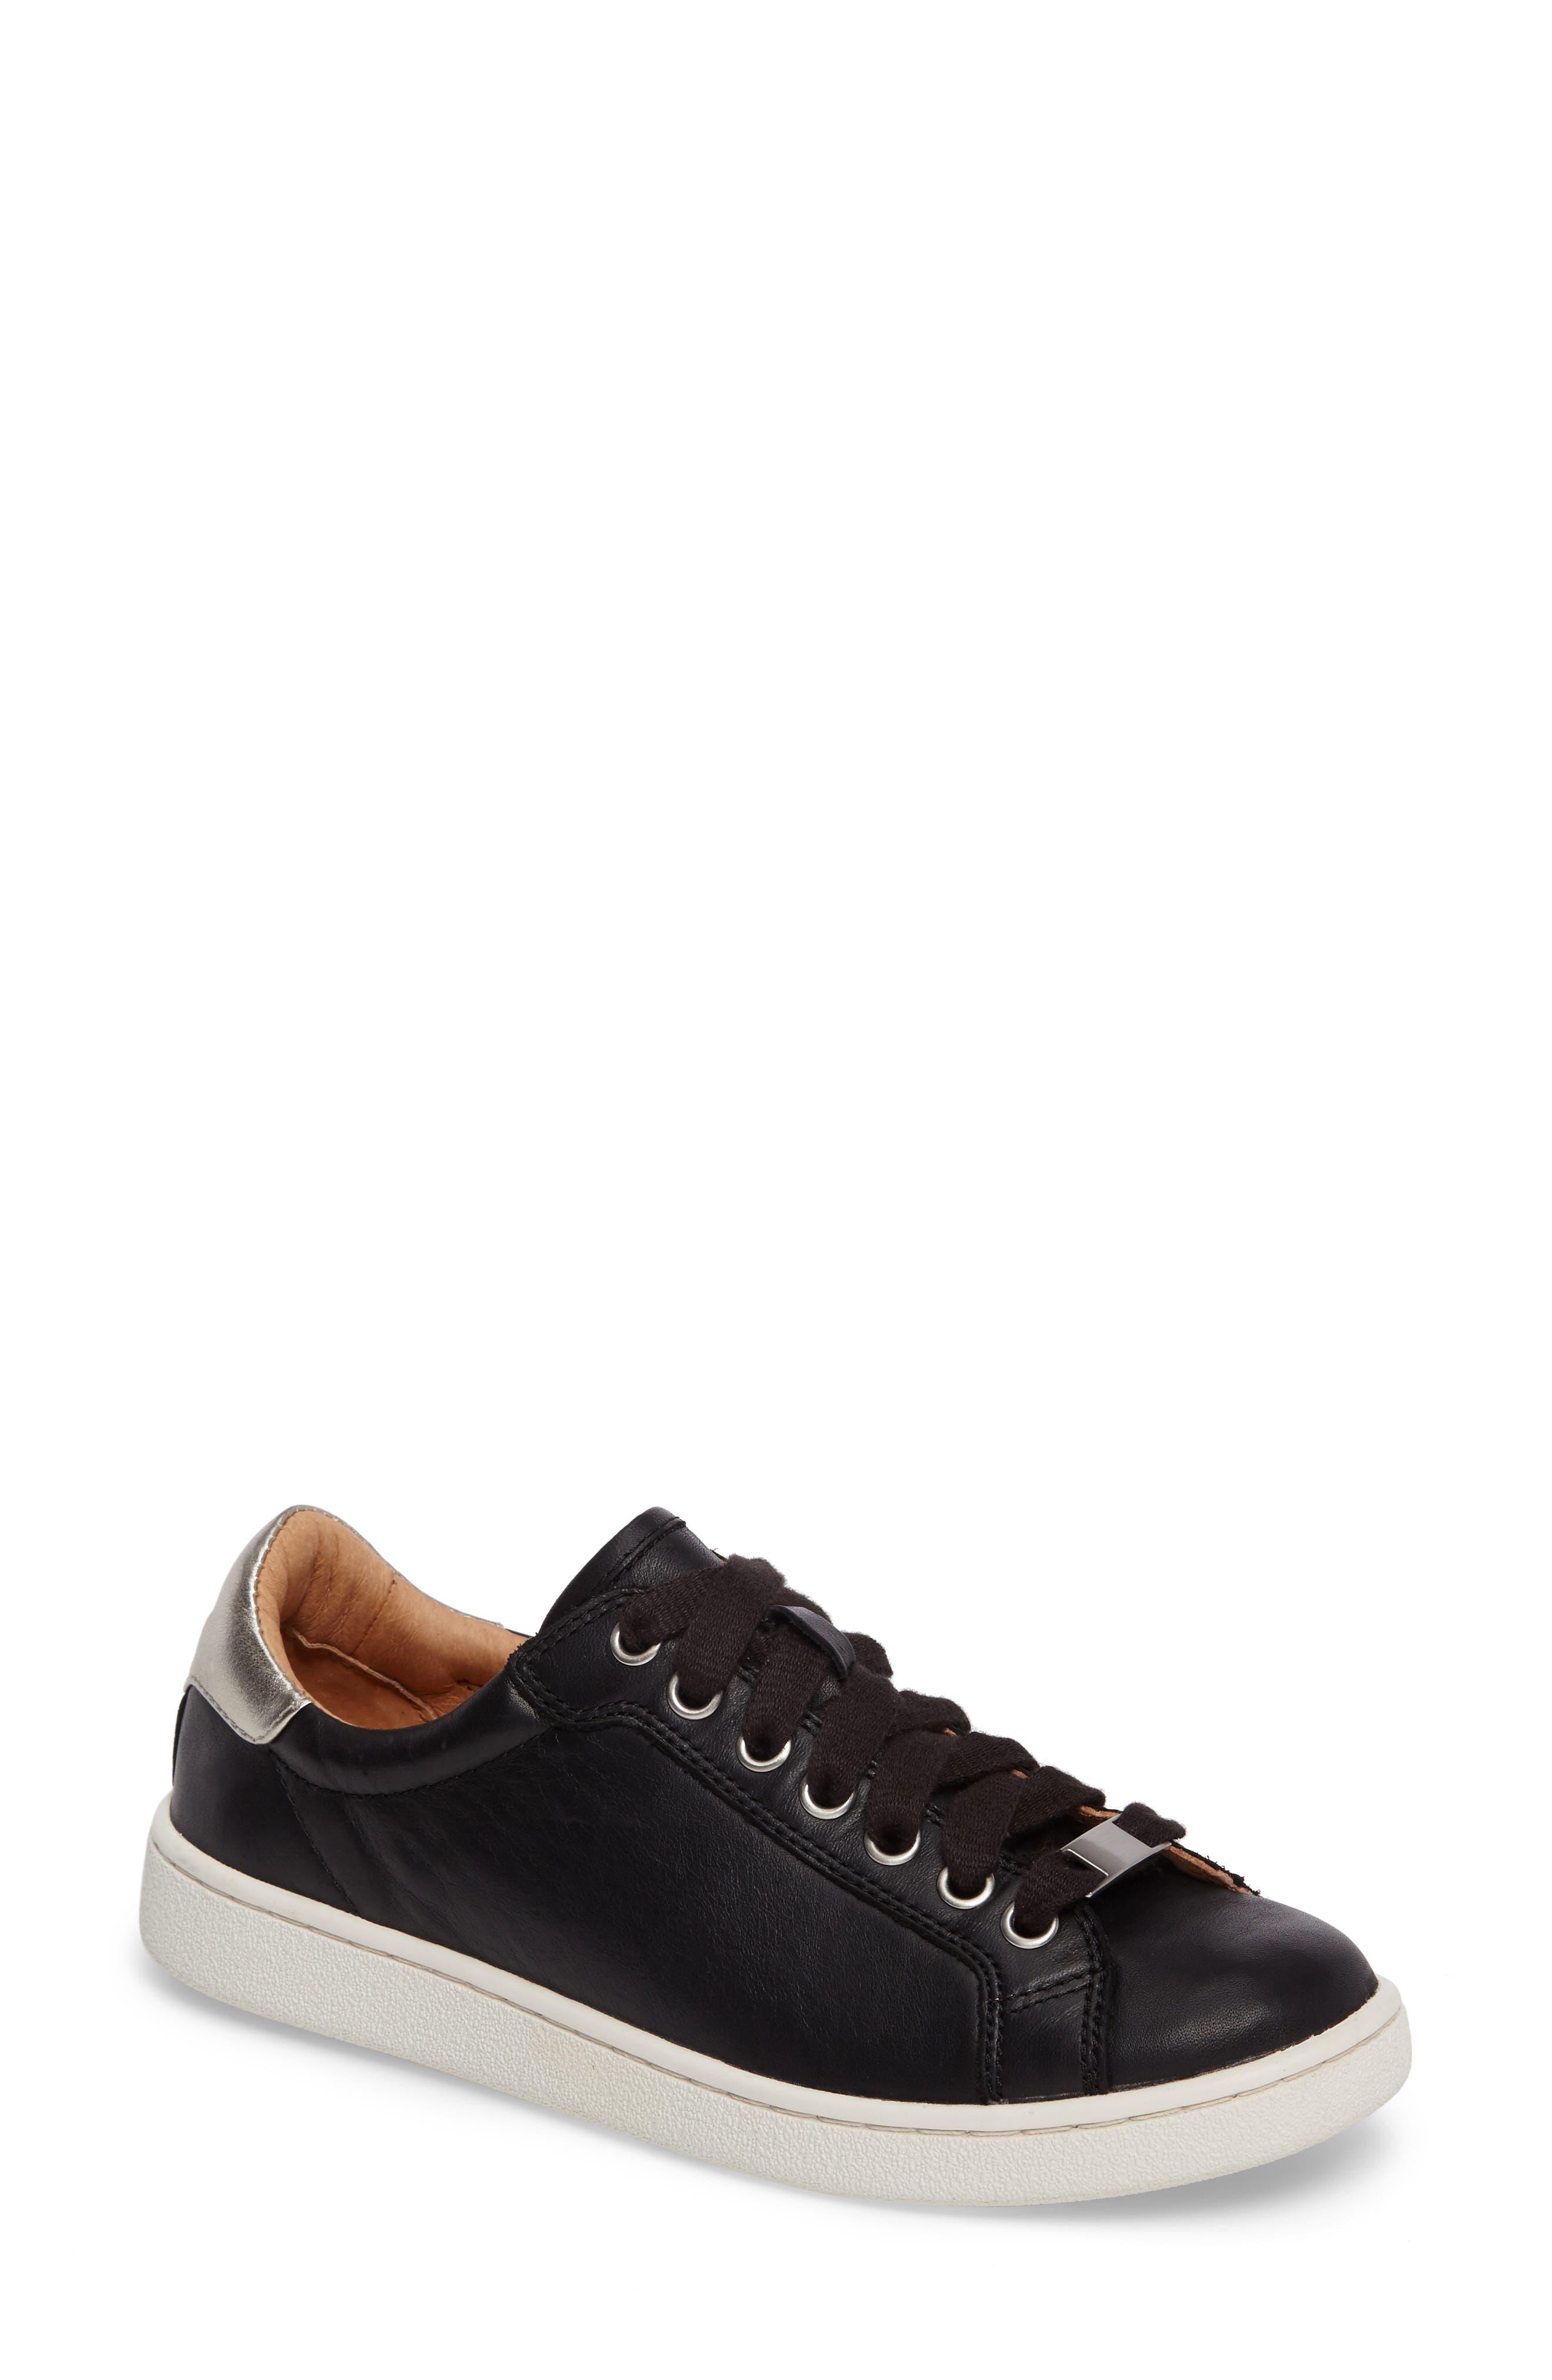 UGG<SUP>®</SUP>, Milo Sneaker, Main thumbnail 1, color, BLACK LEATHER